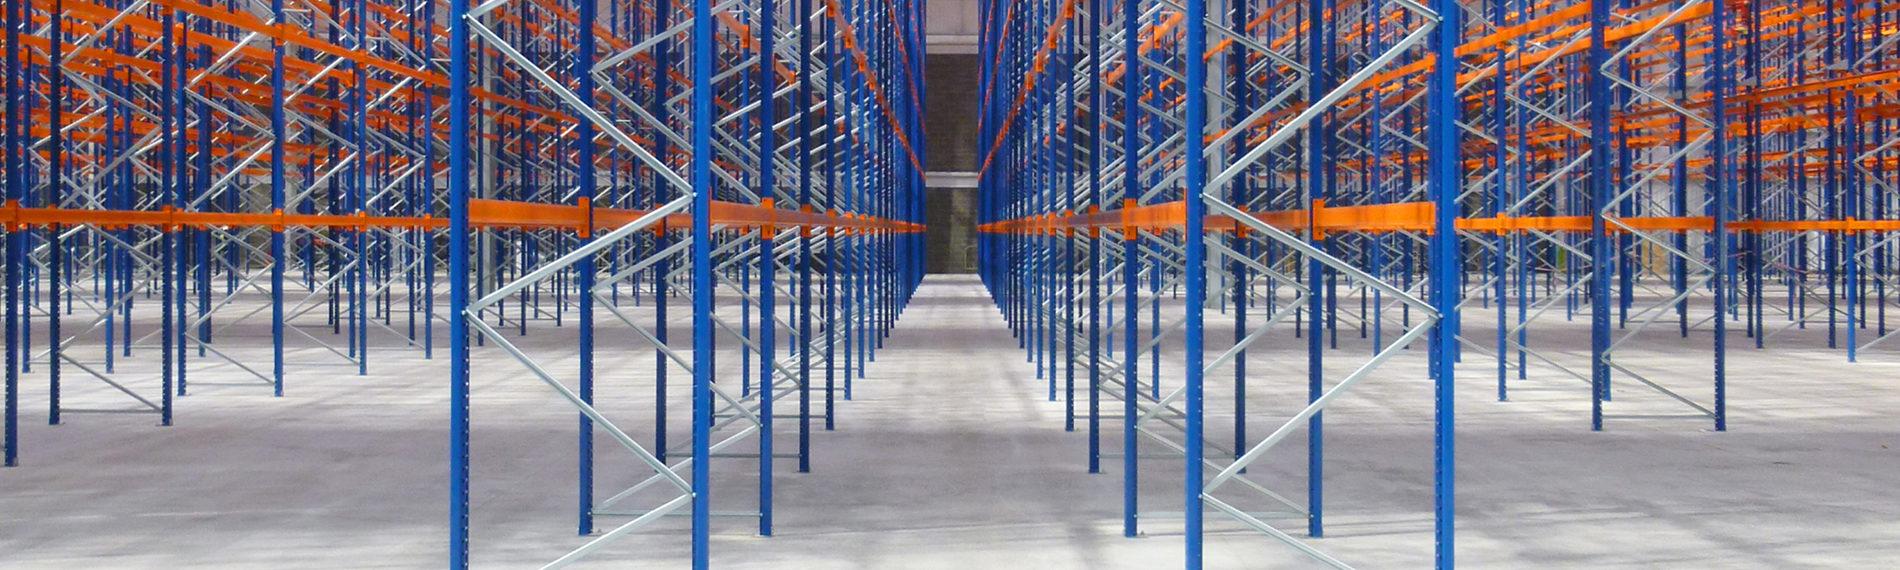 regalsystem blau orange halle